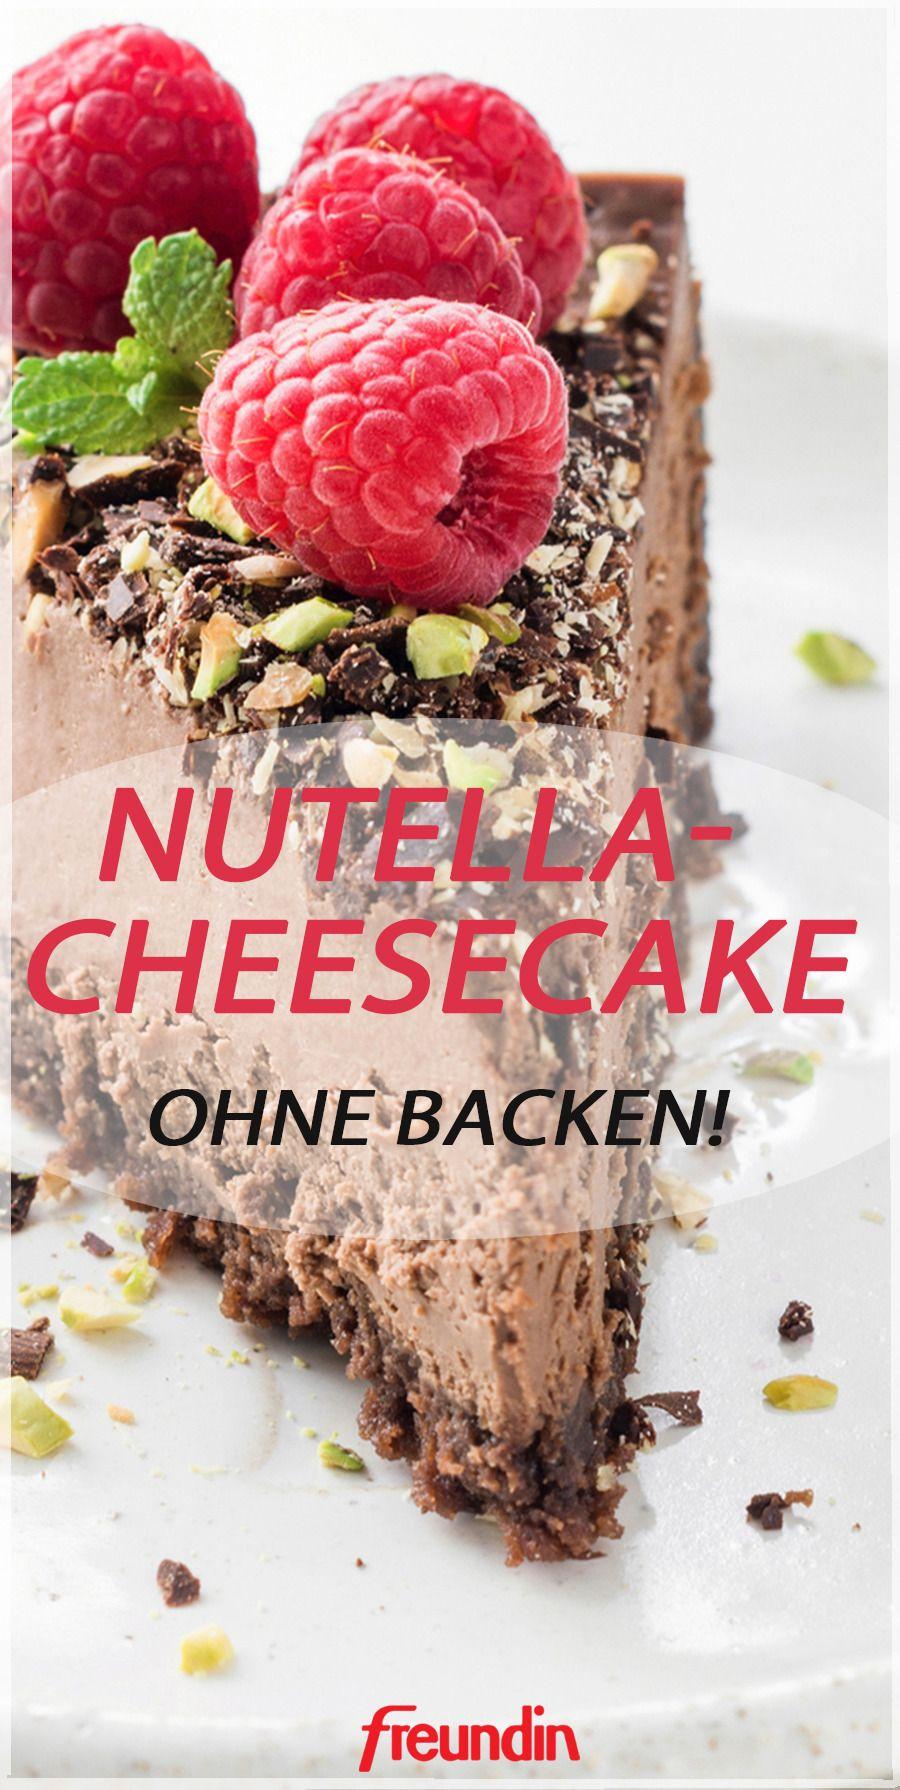 Sonntags-Rezept: Nutella-Cheesecake ohne Backen | freundin.de